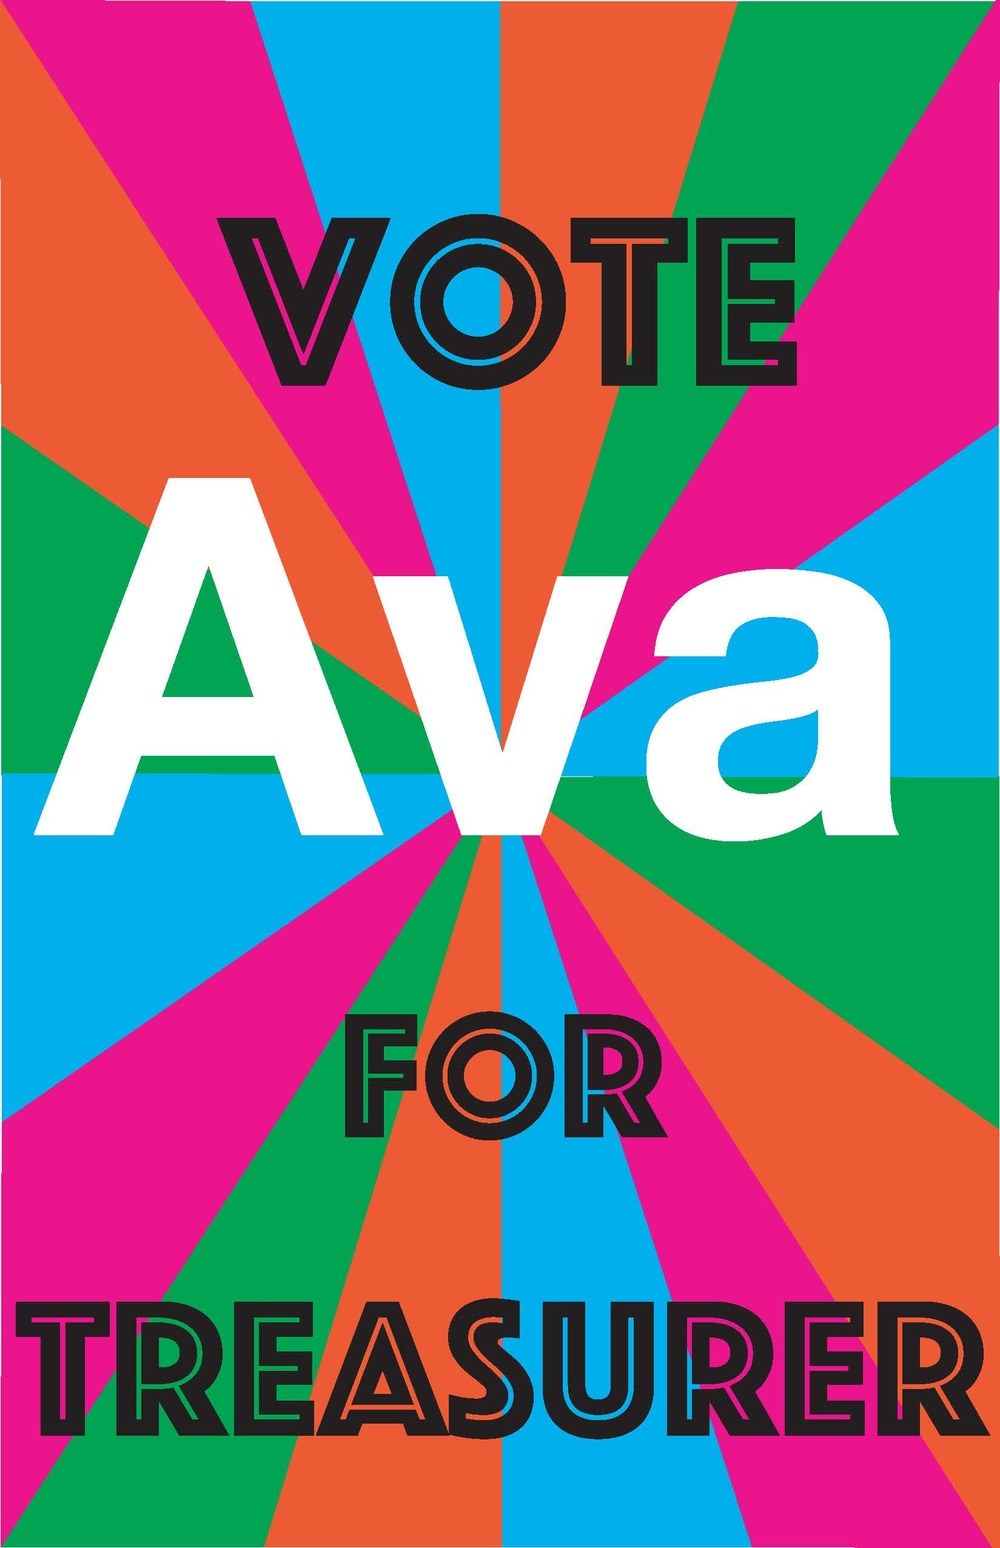 Treasurer Nomination Poster